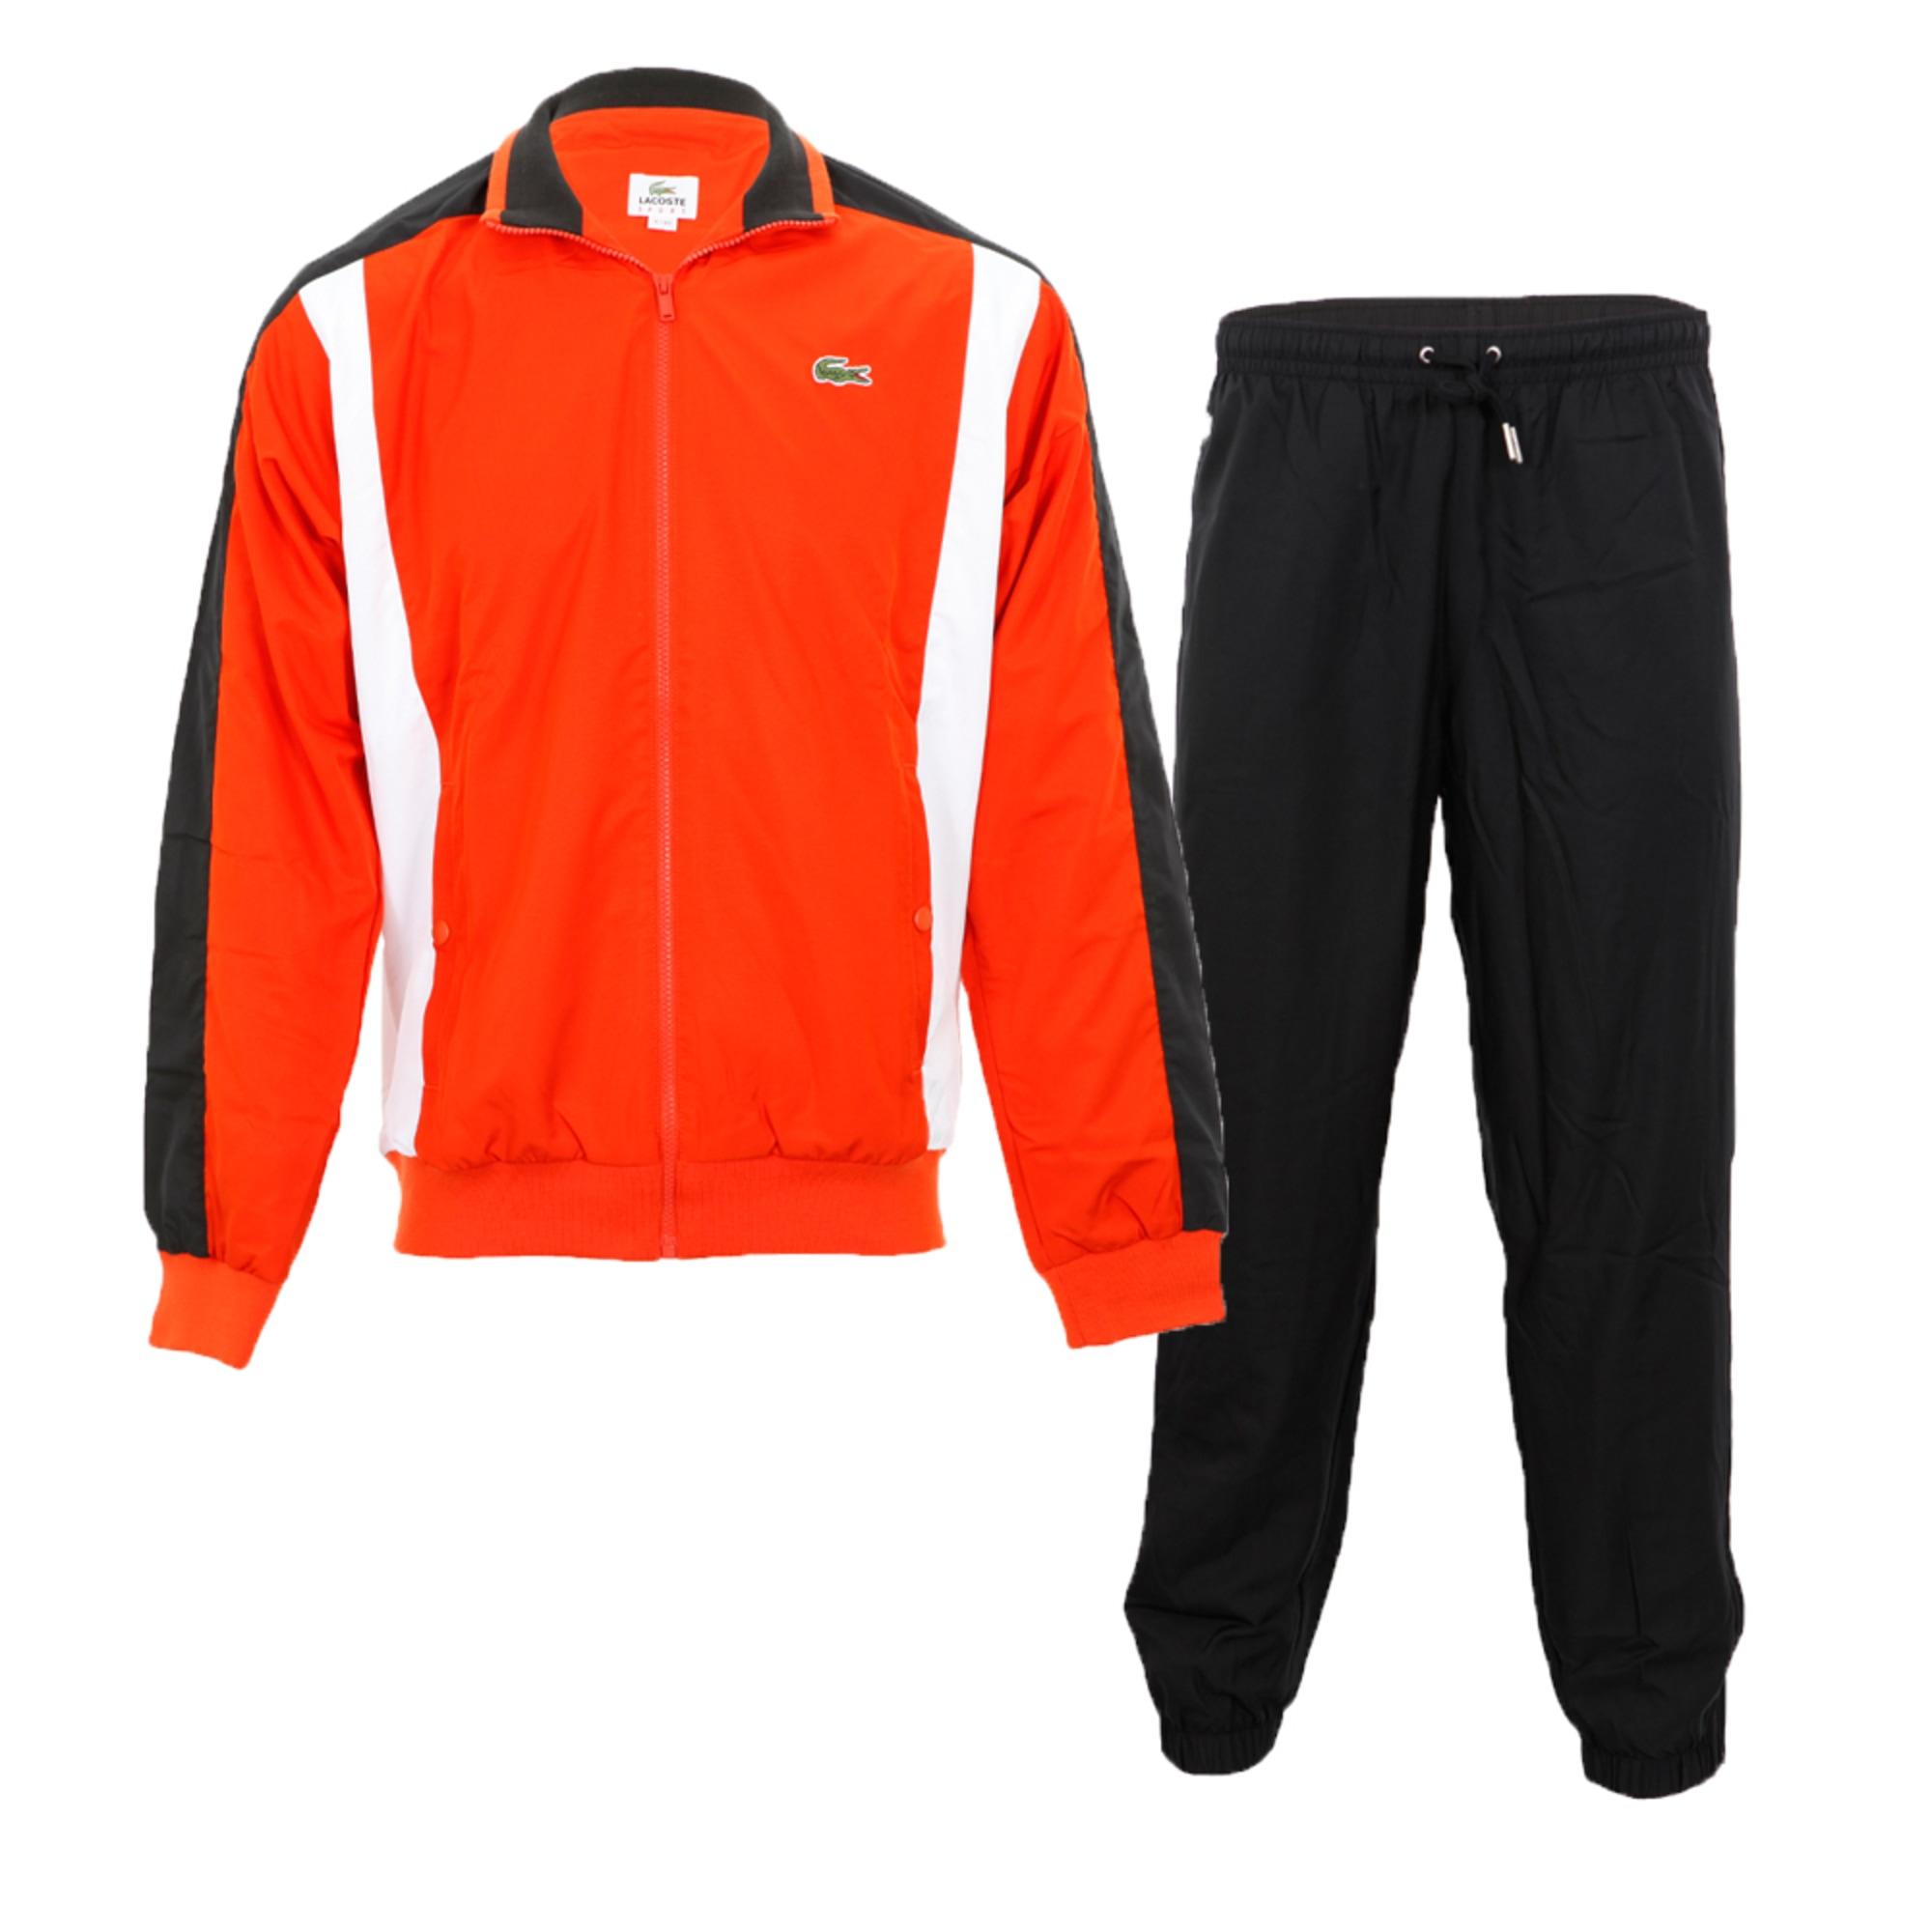 528f514c9f9c Ensemble jogging LACOSTE 52 (L) orange vendu par Vidressing71100 ...